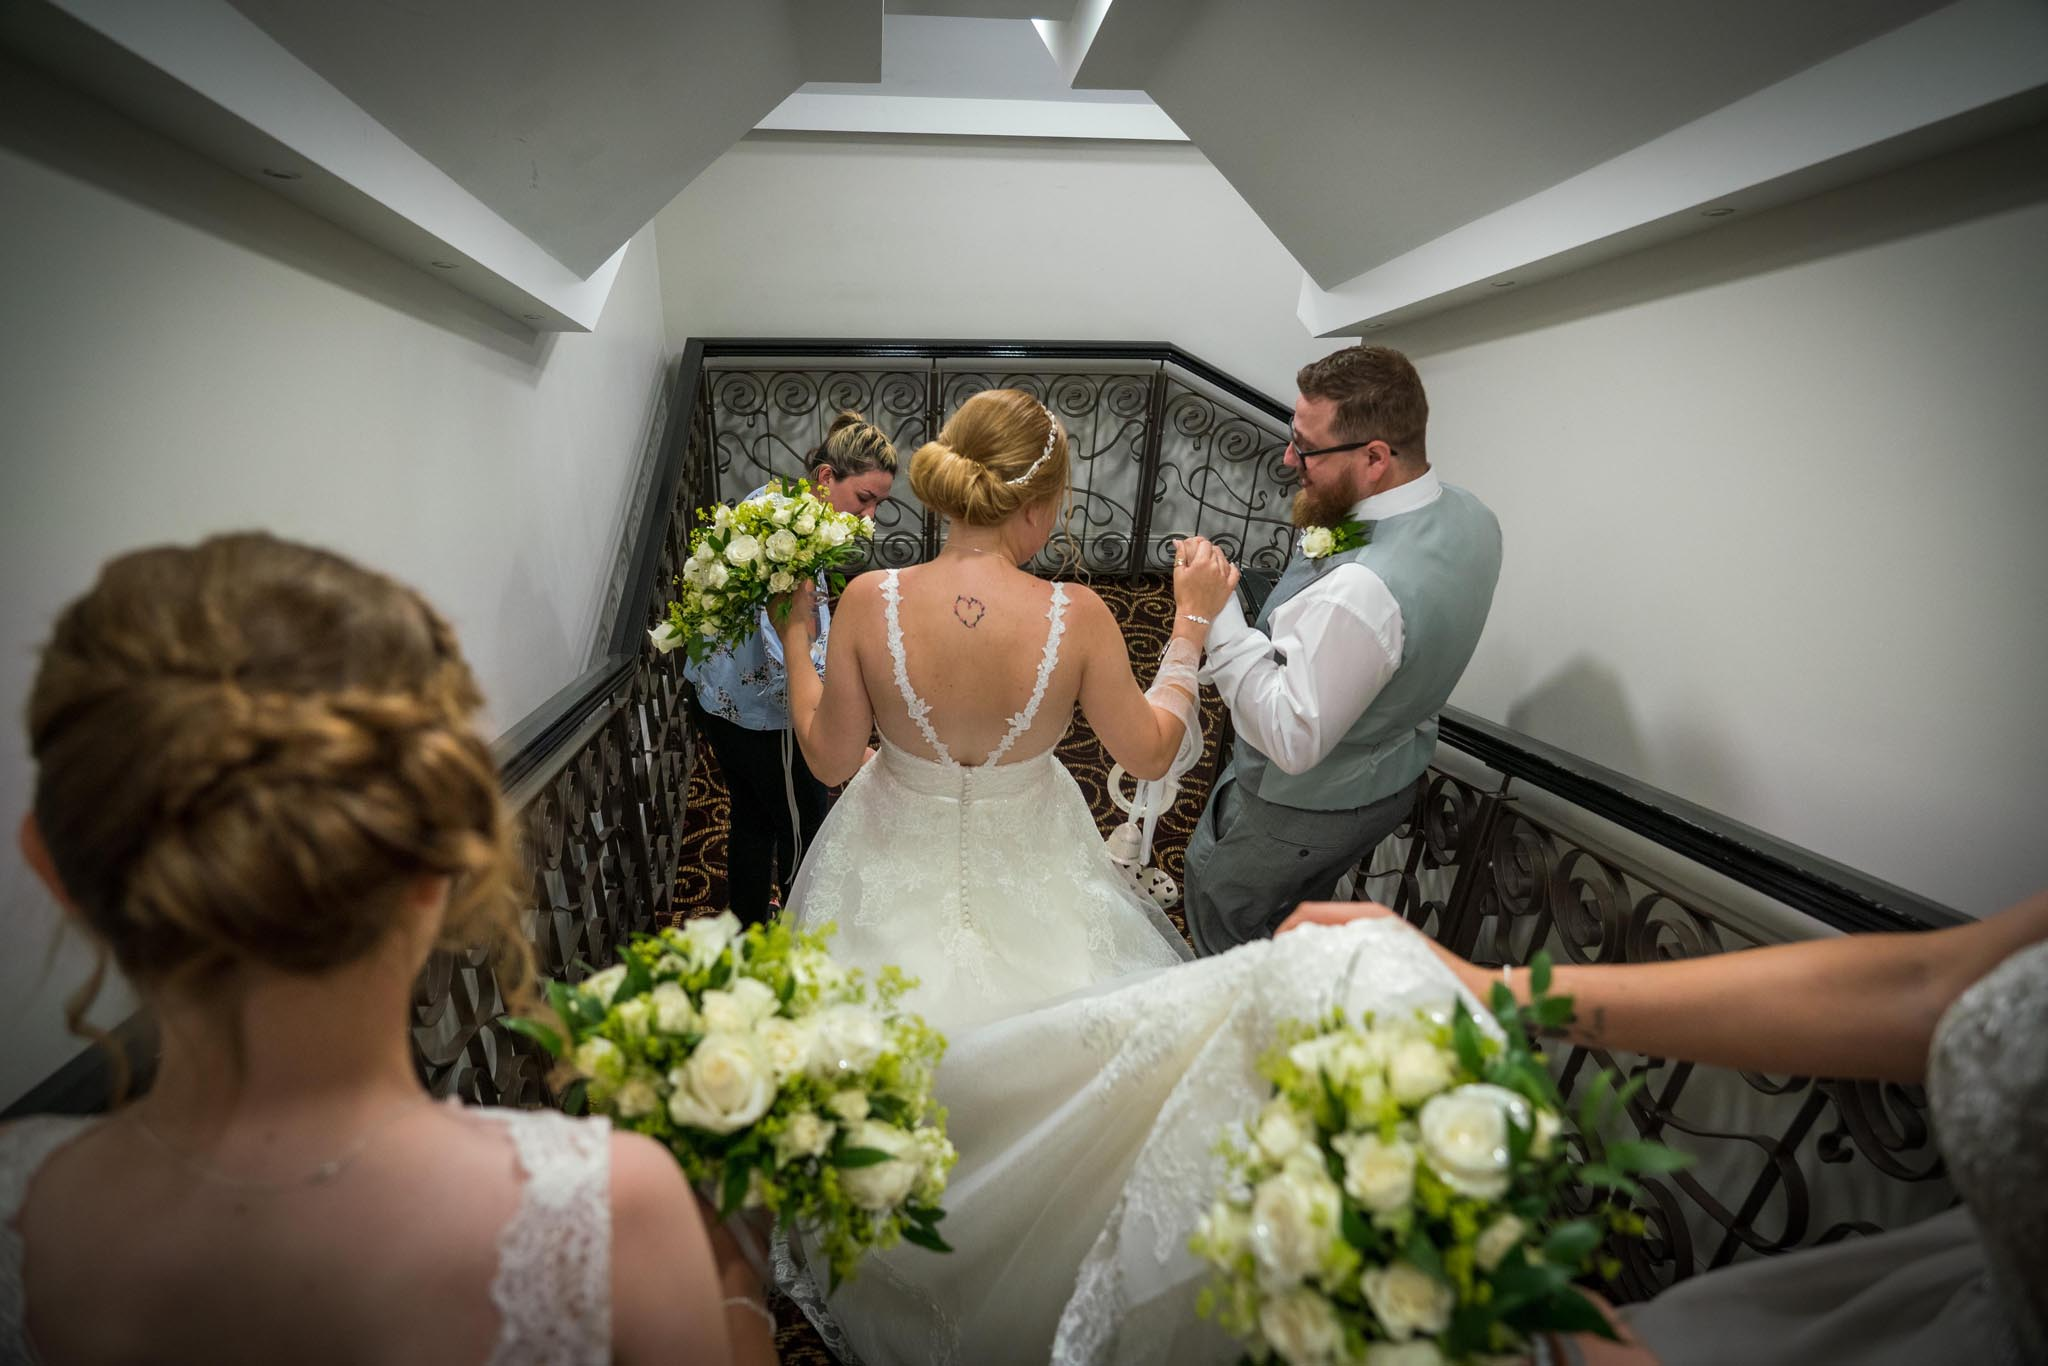 503-Ceremony-Luke-Yasmin-The-Rayleigh-Club-Wedding-Photography.jpg